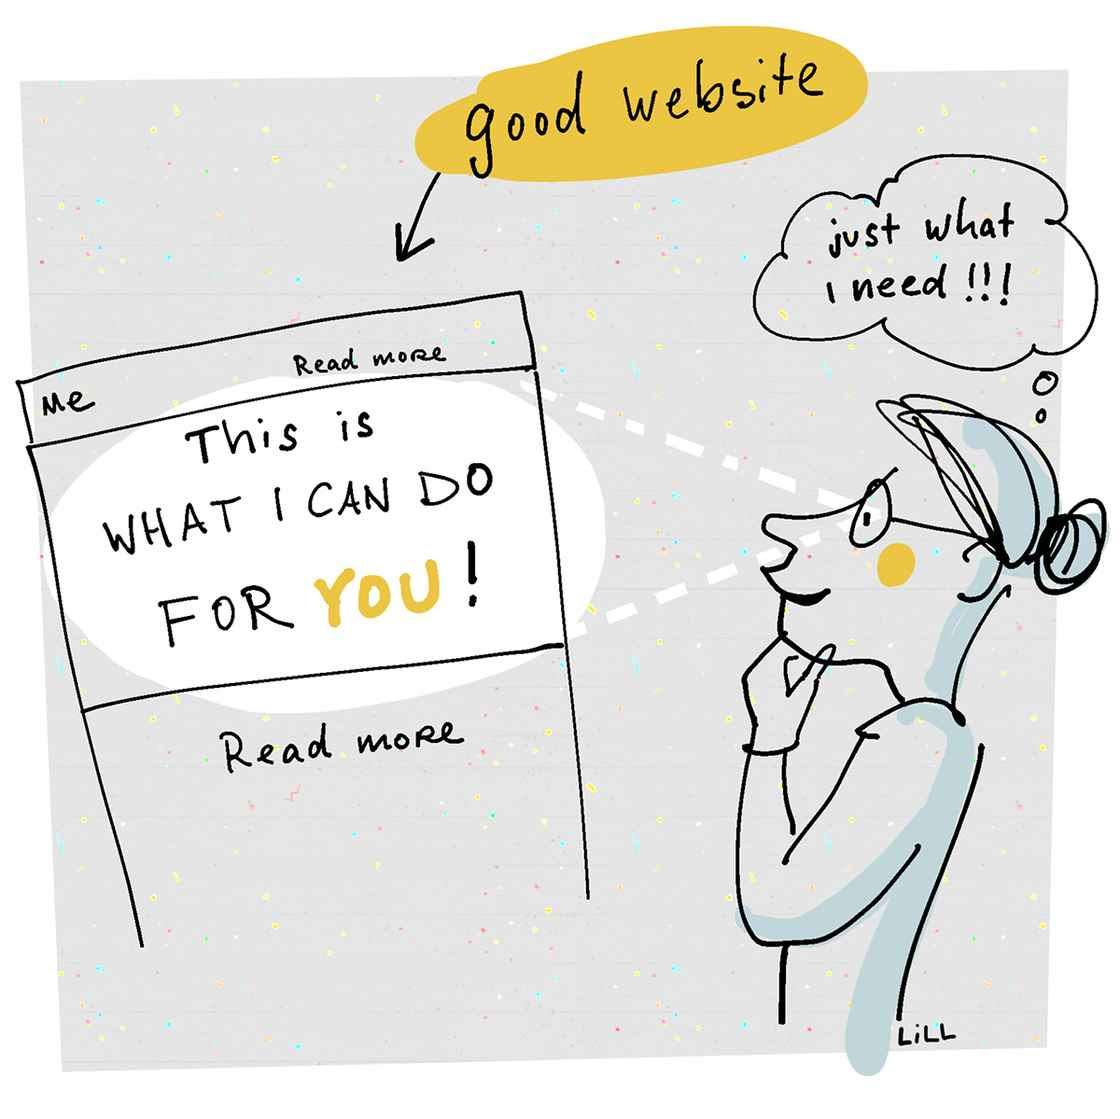 good website